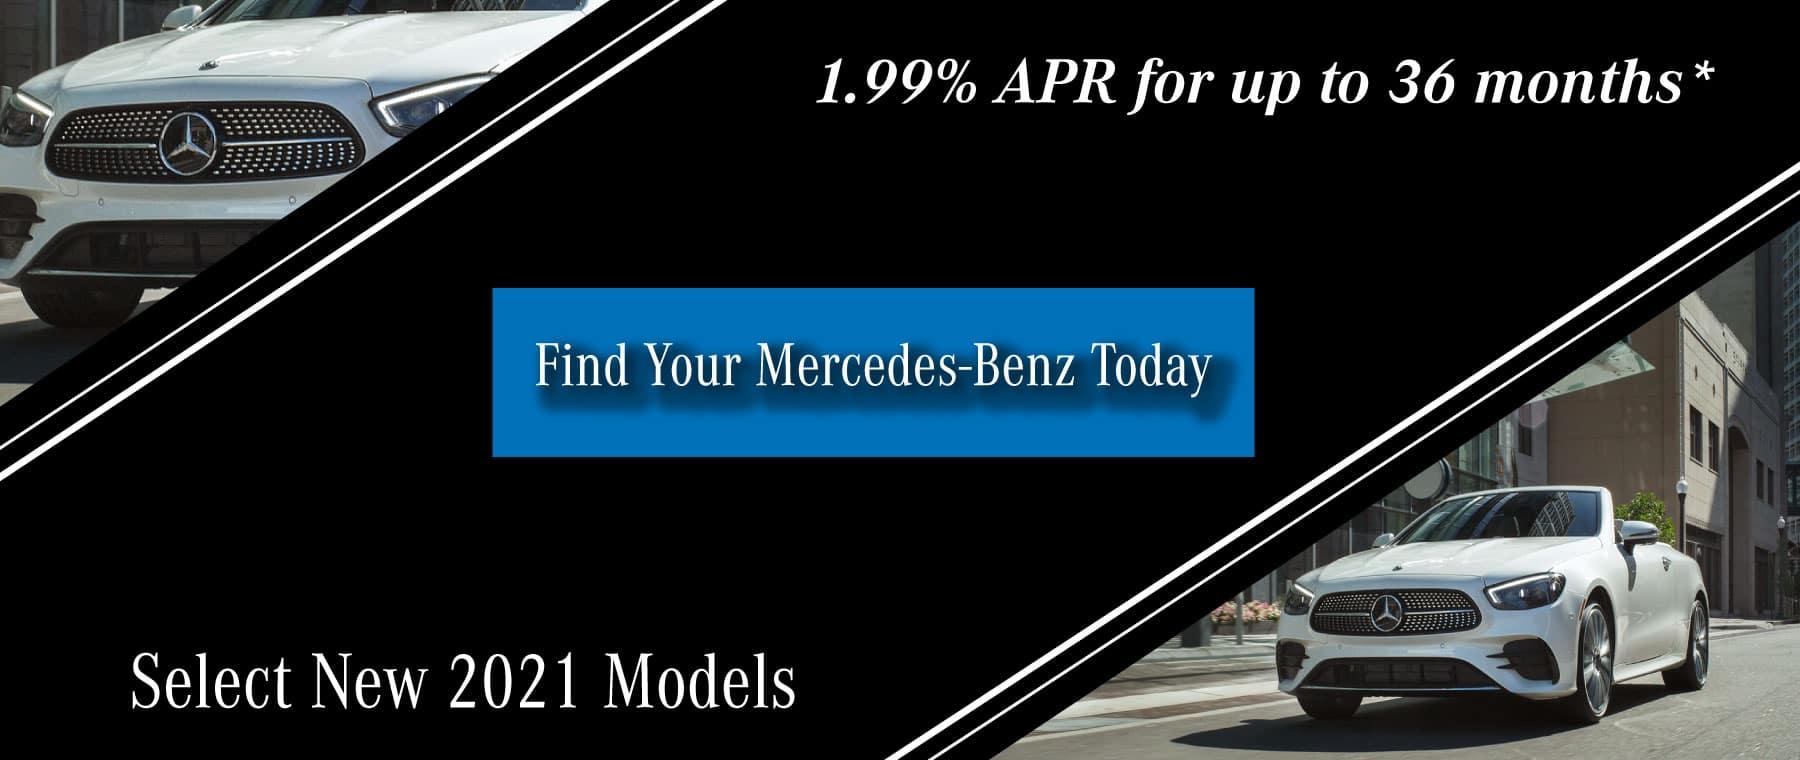 Select New 2021 Models